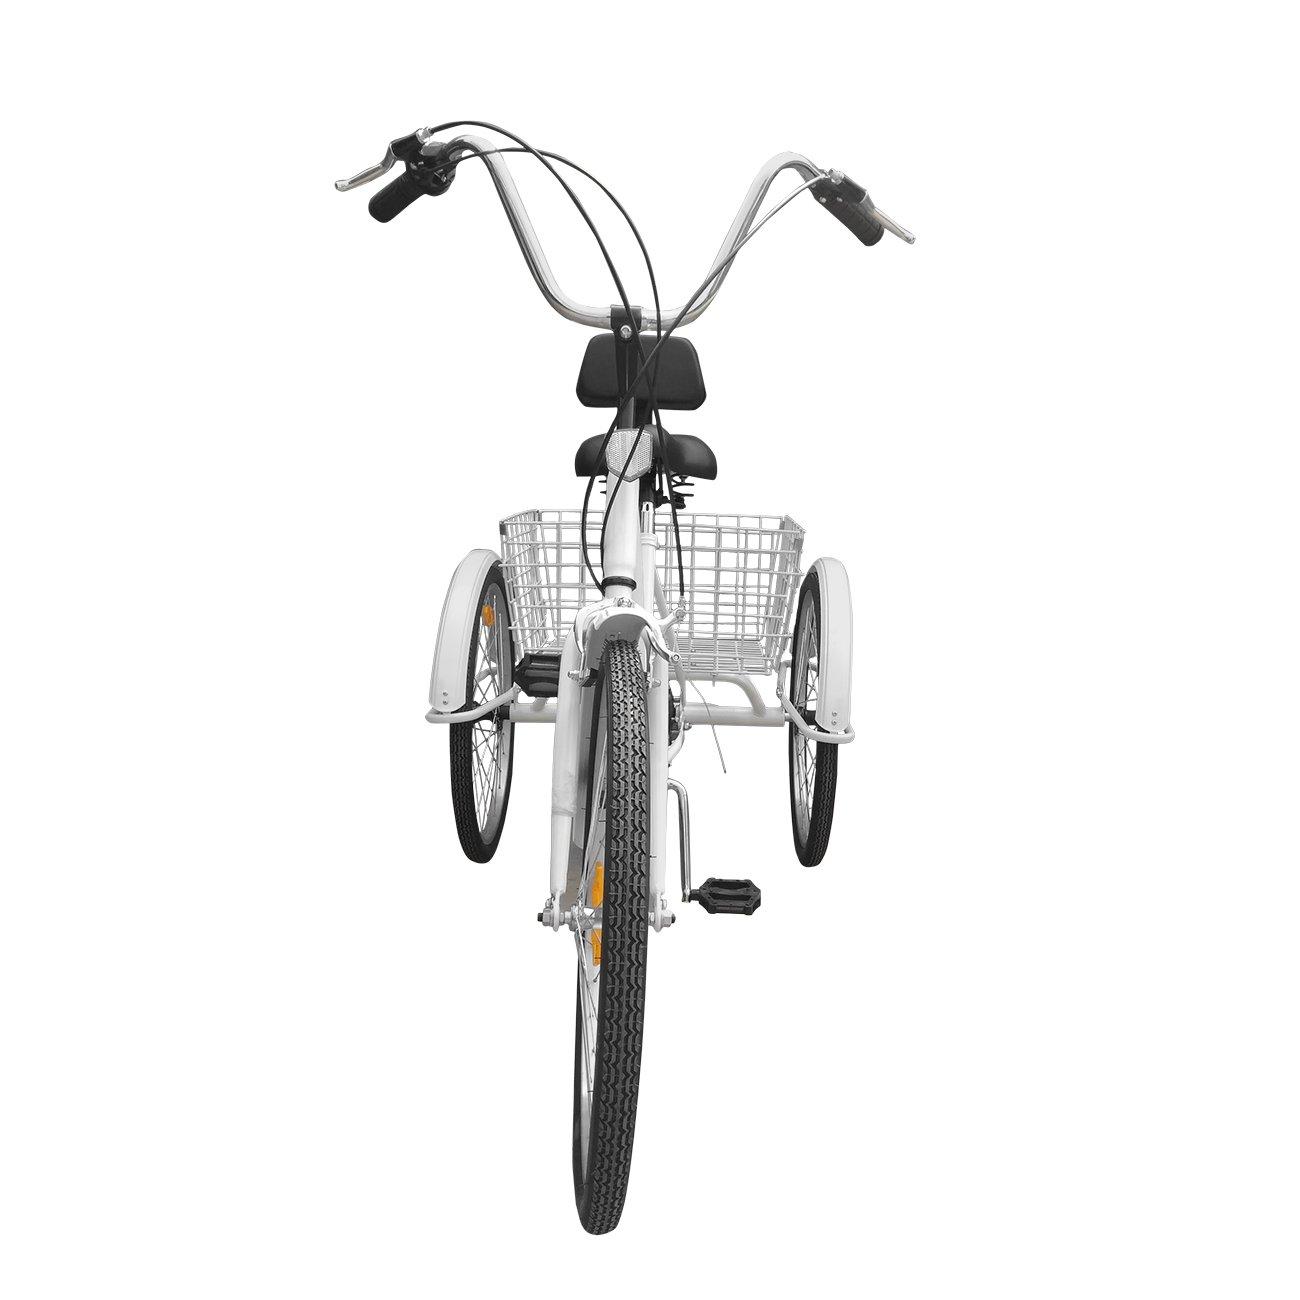 Bici a 3 ruote Urban Paneltech per adulti 6 velocitàe cestino04